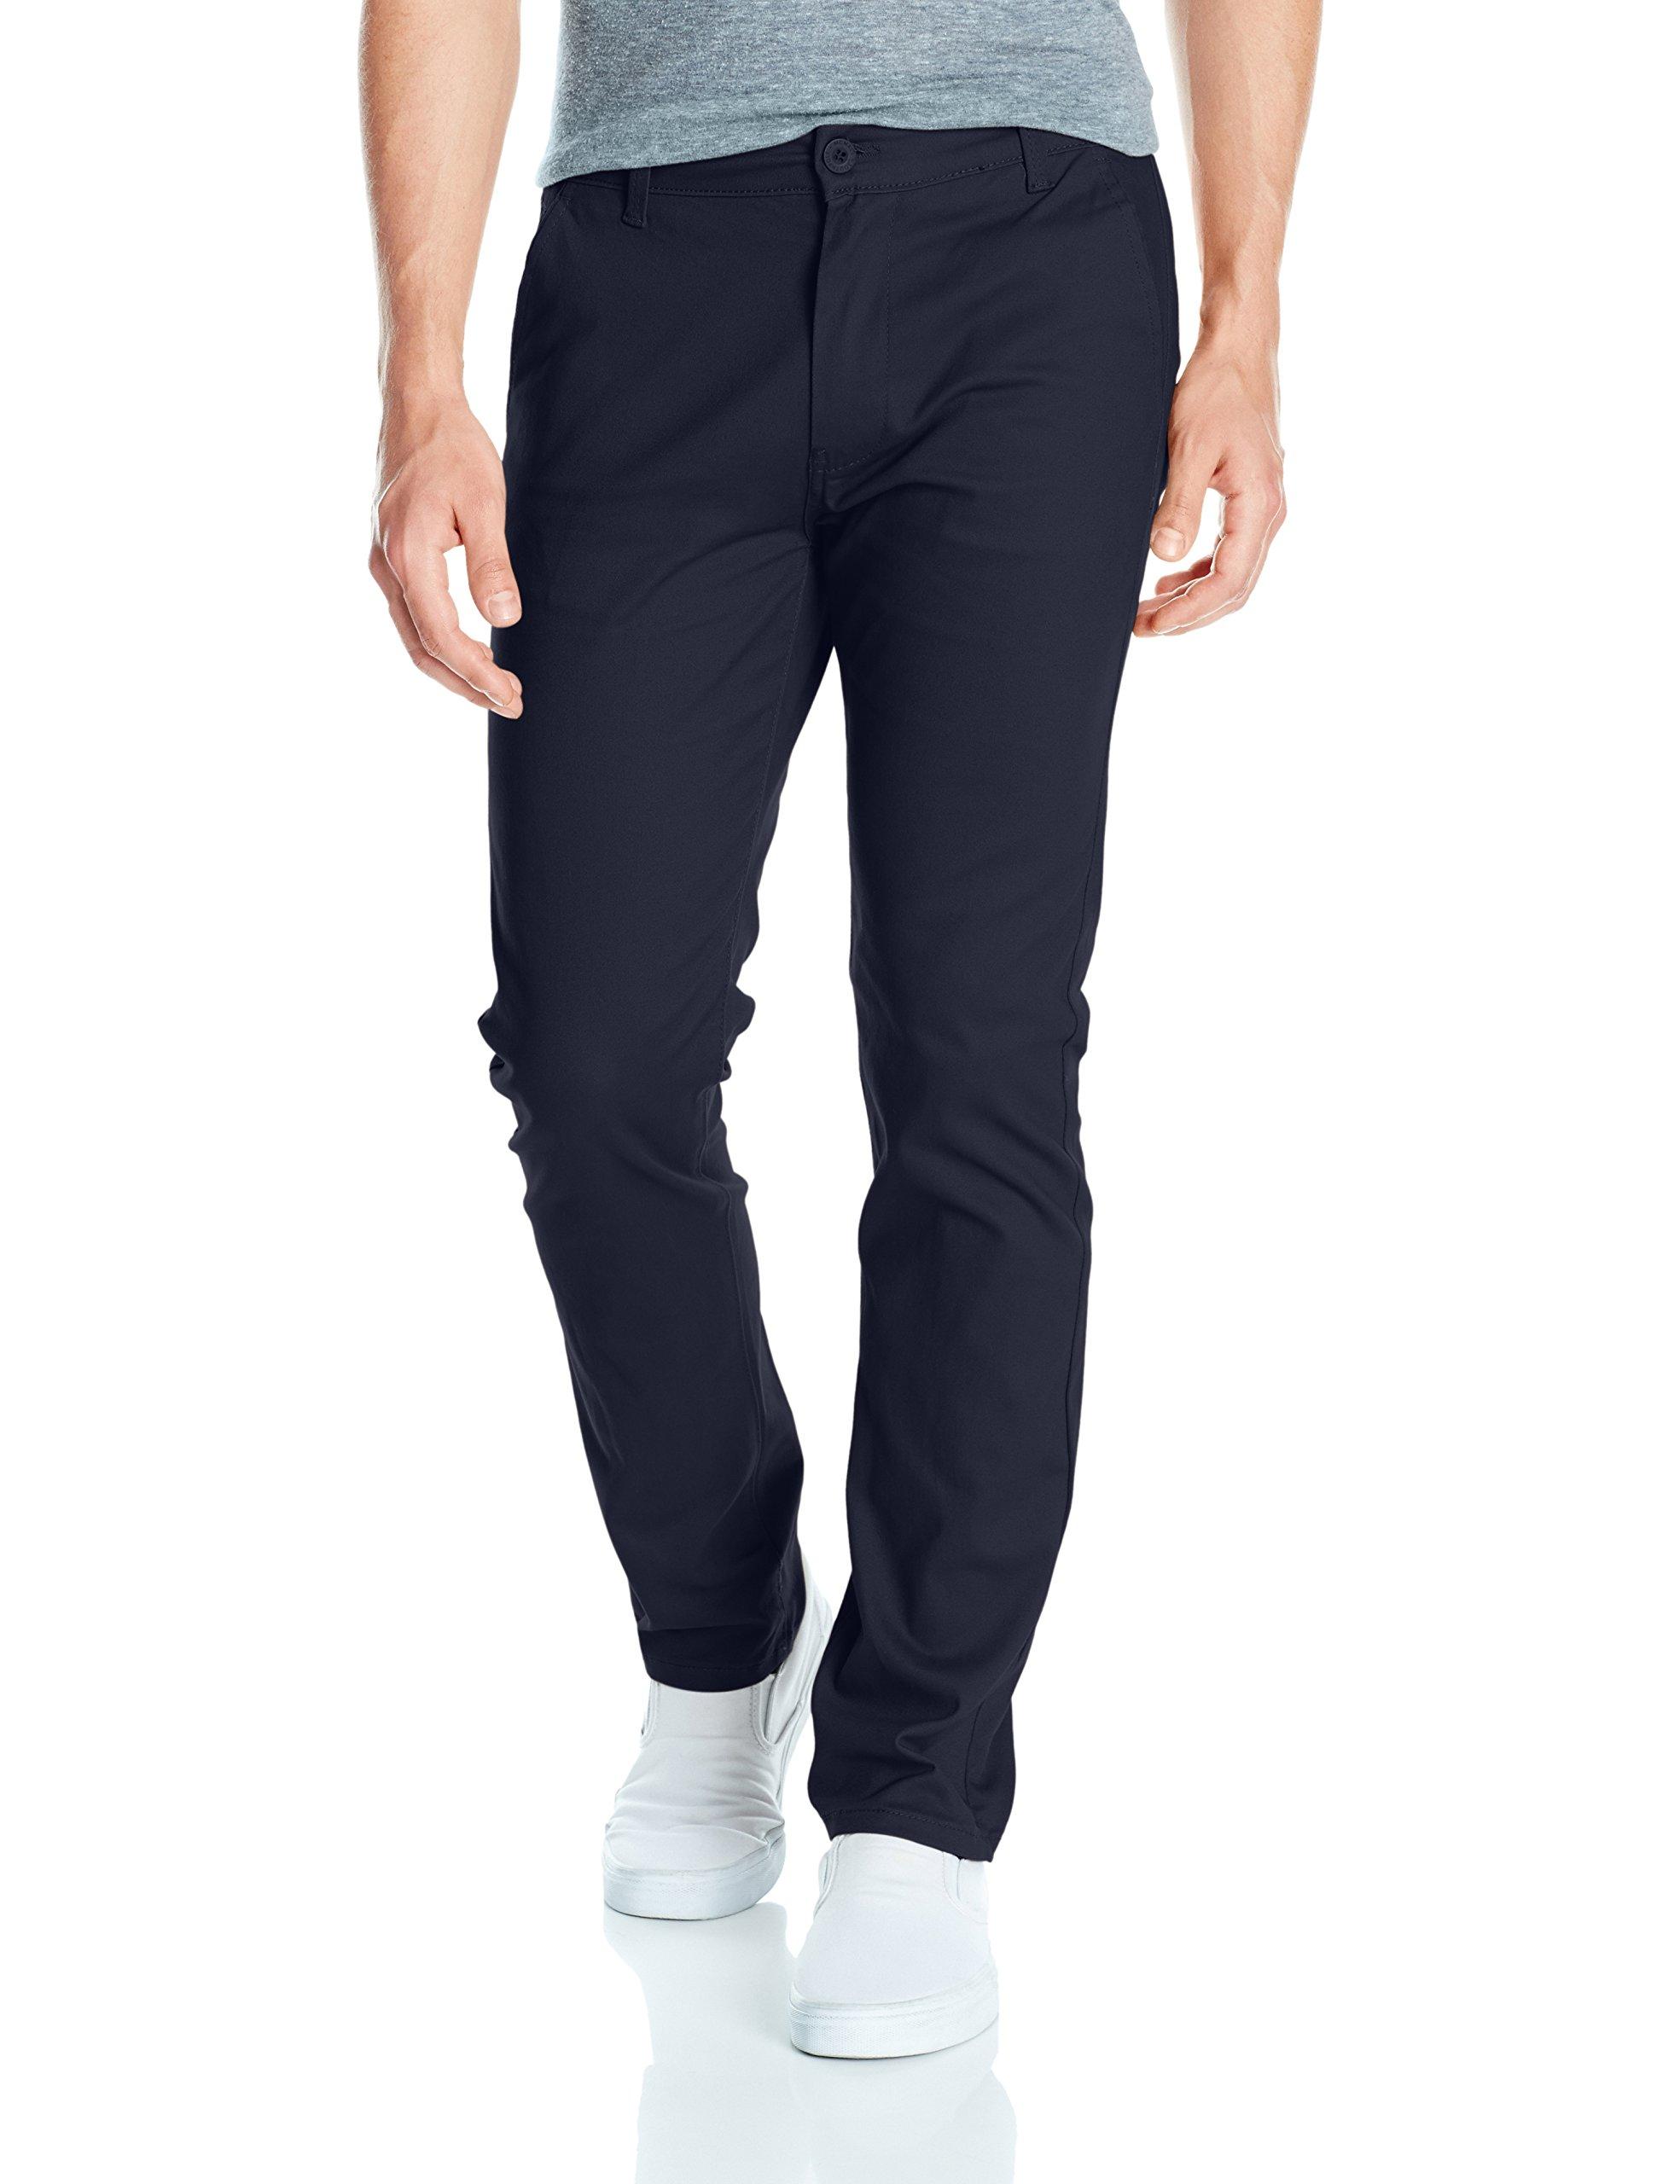 Southpole Men's Flex Stretch Basic Long Chino Pants, New Navy (New), 42X34